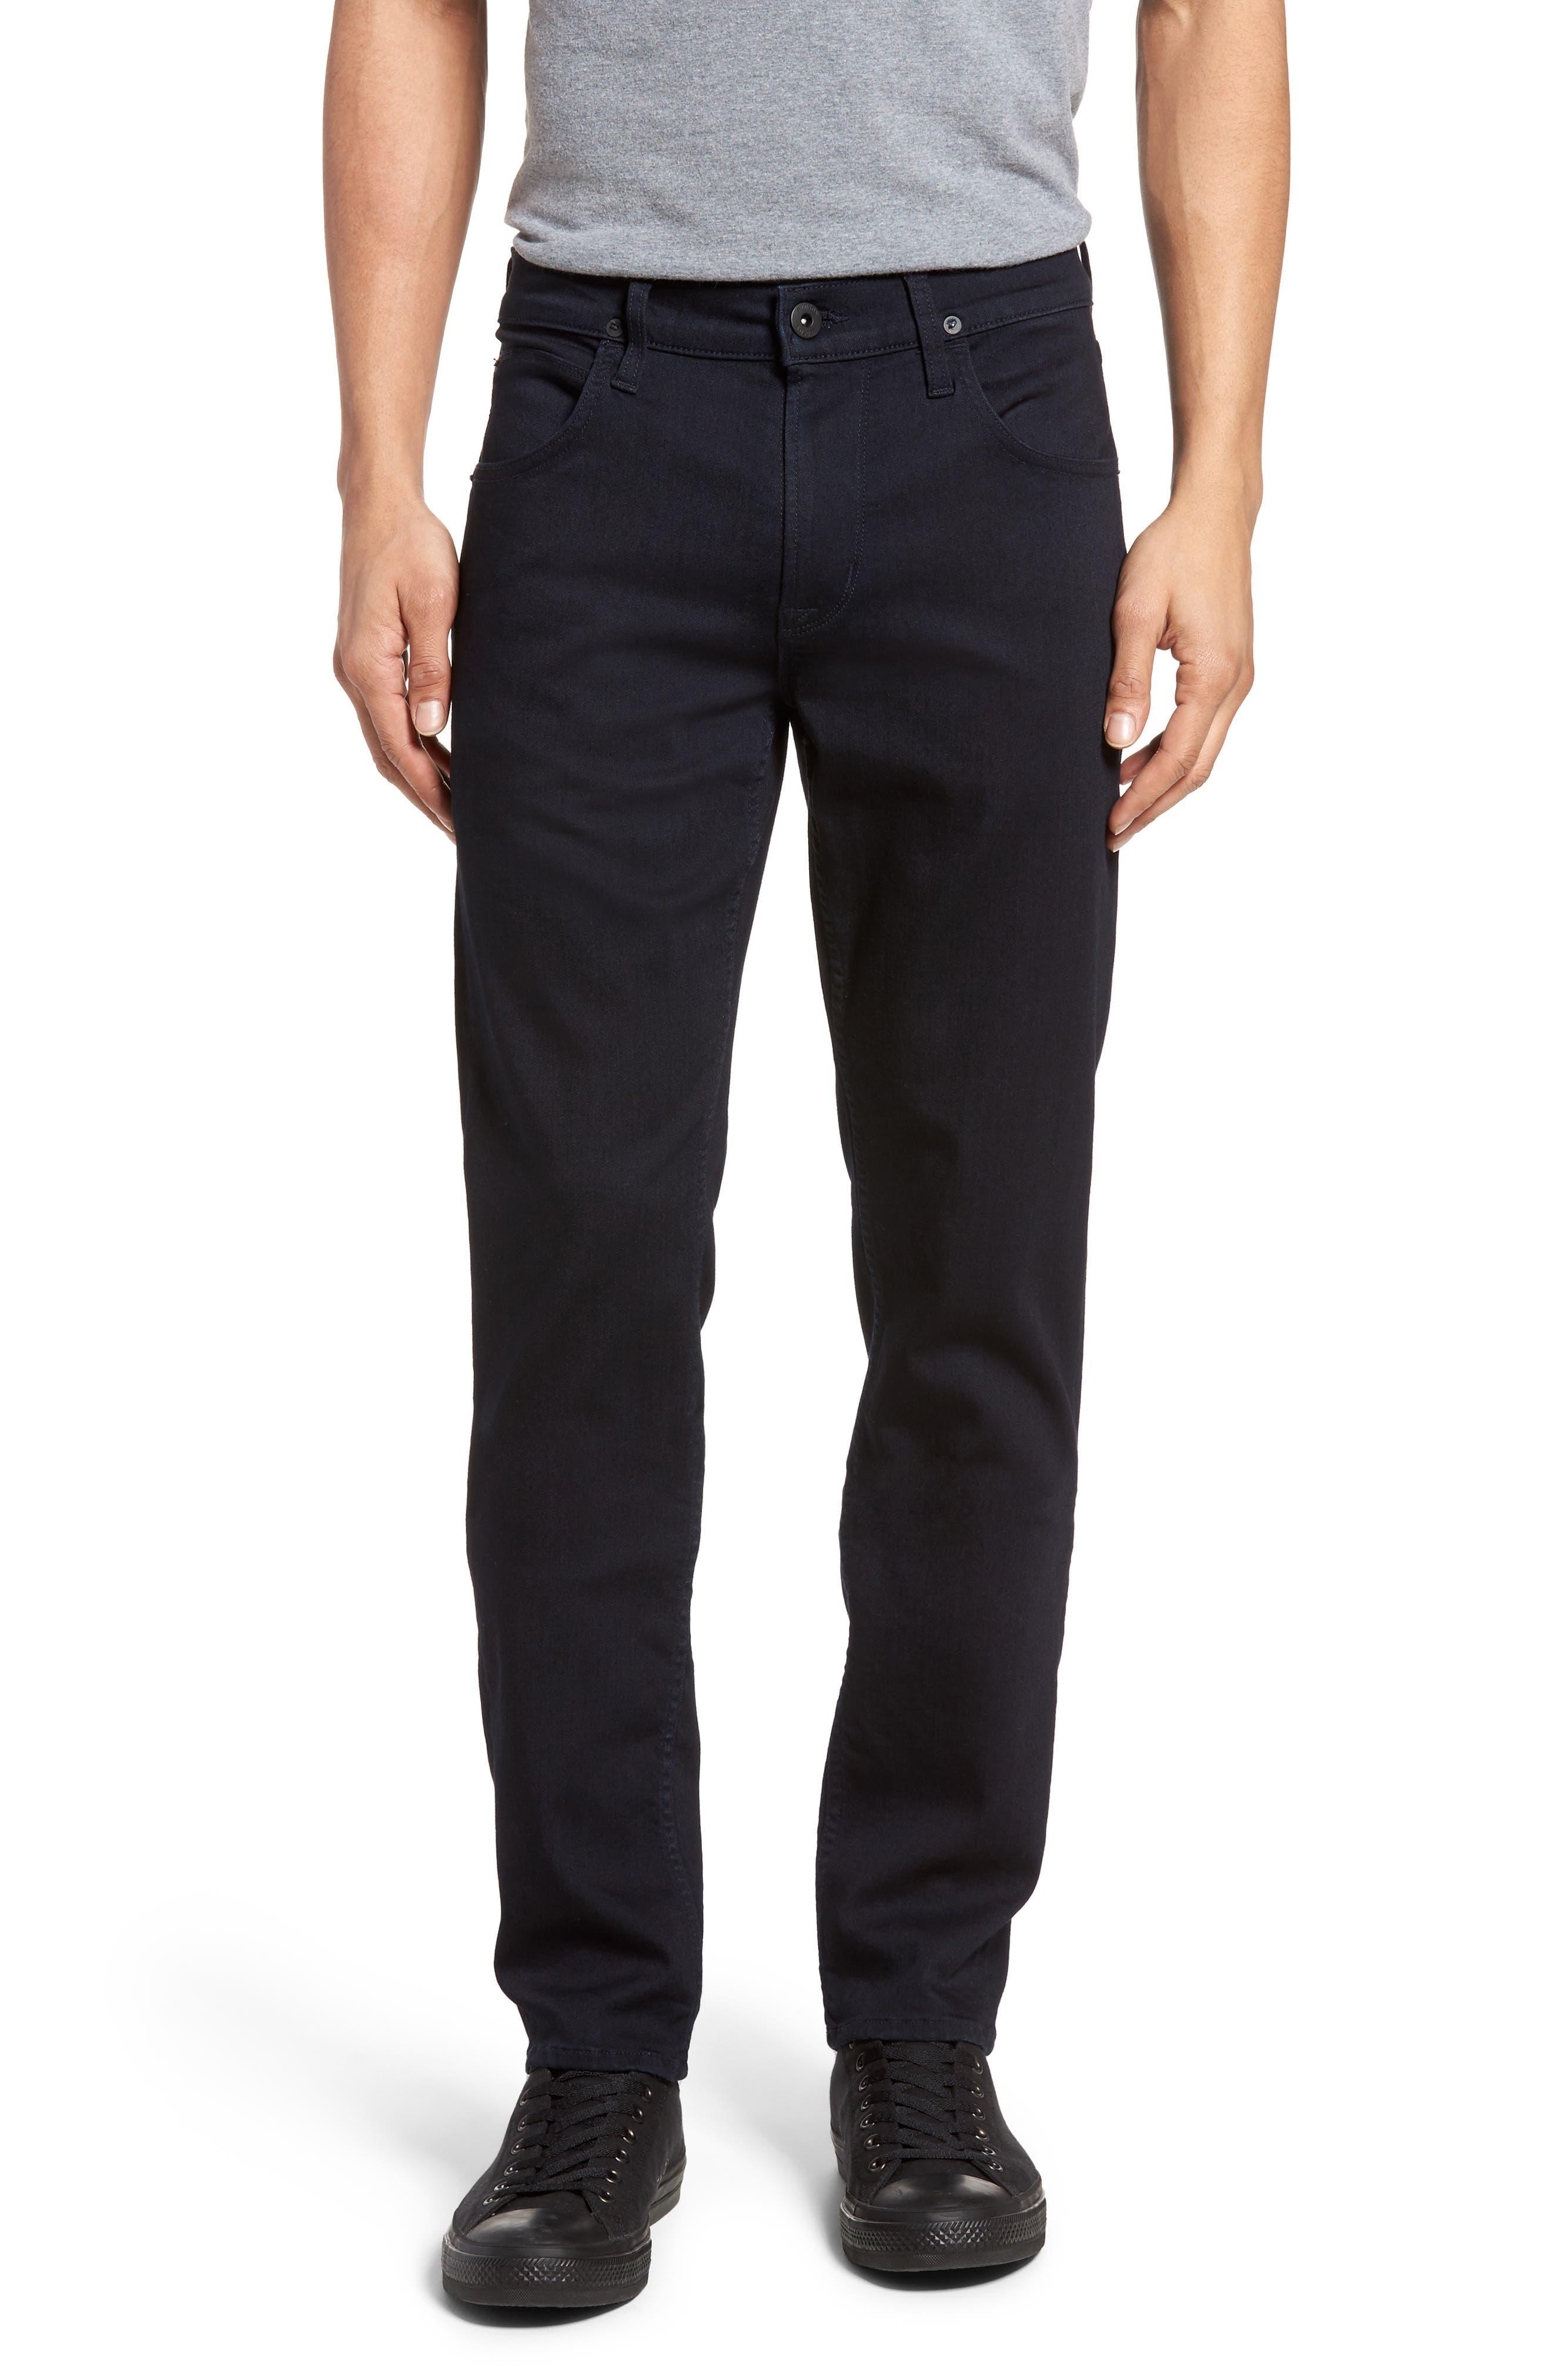 Blake Slim Fit Jeans,                         Main,                         color, Hale Navy